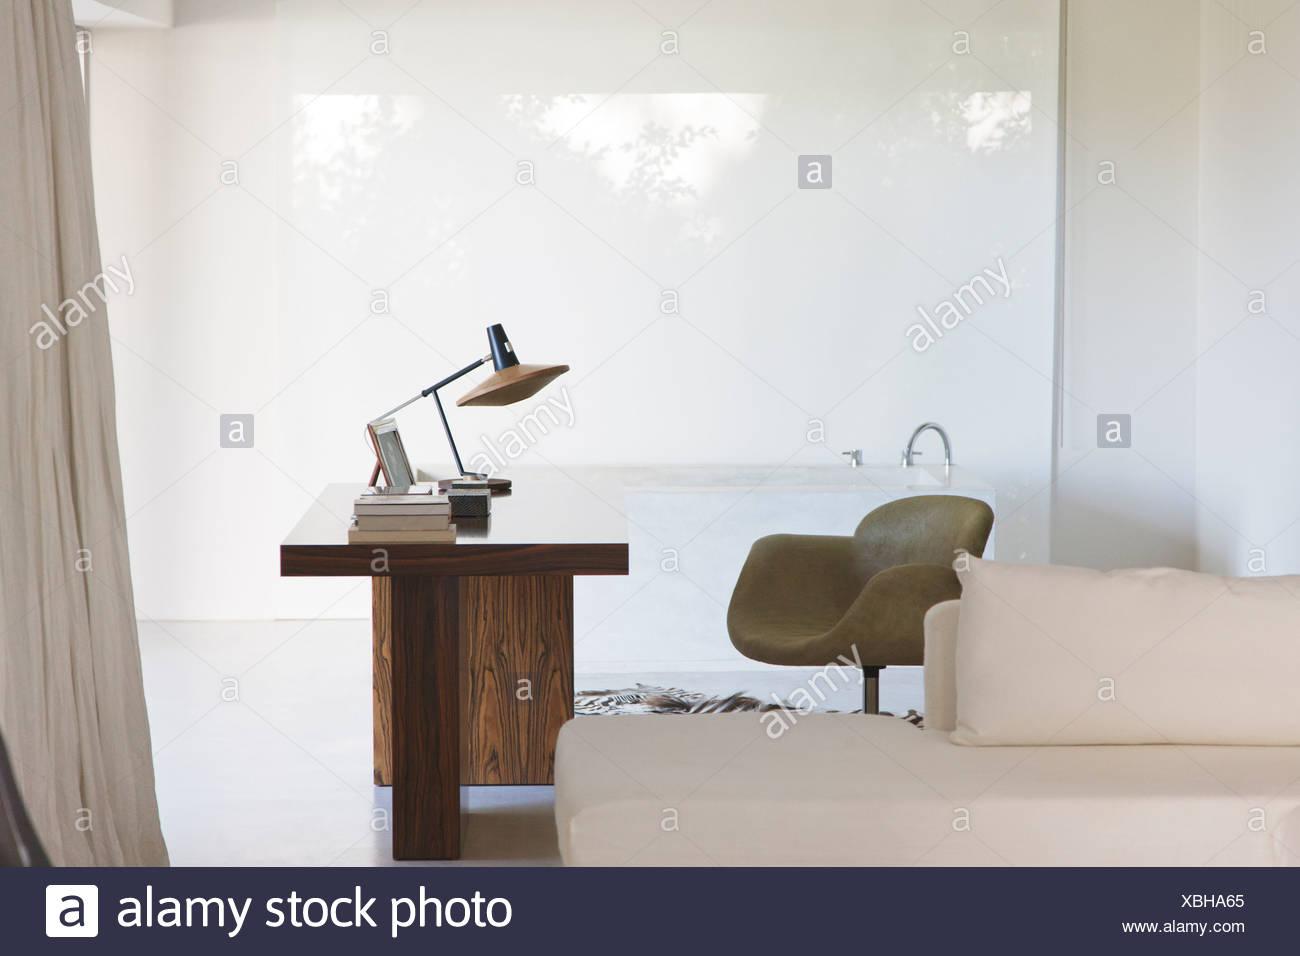 Desk and bathtub in modern home Stock Photo: 282508301 - Alamy